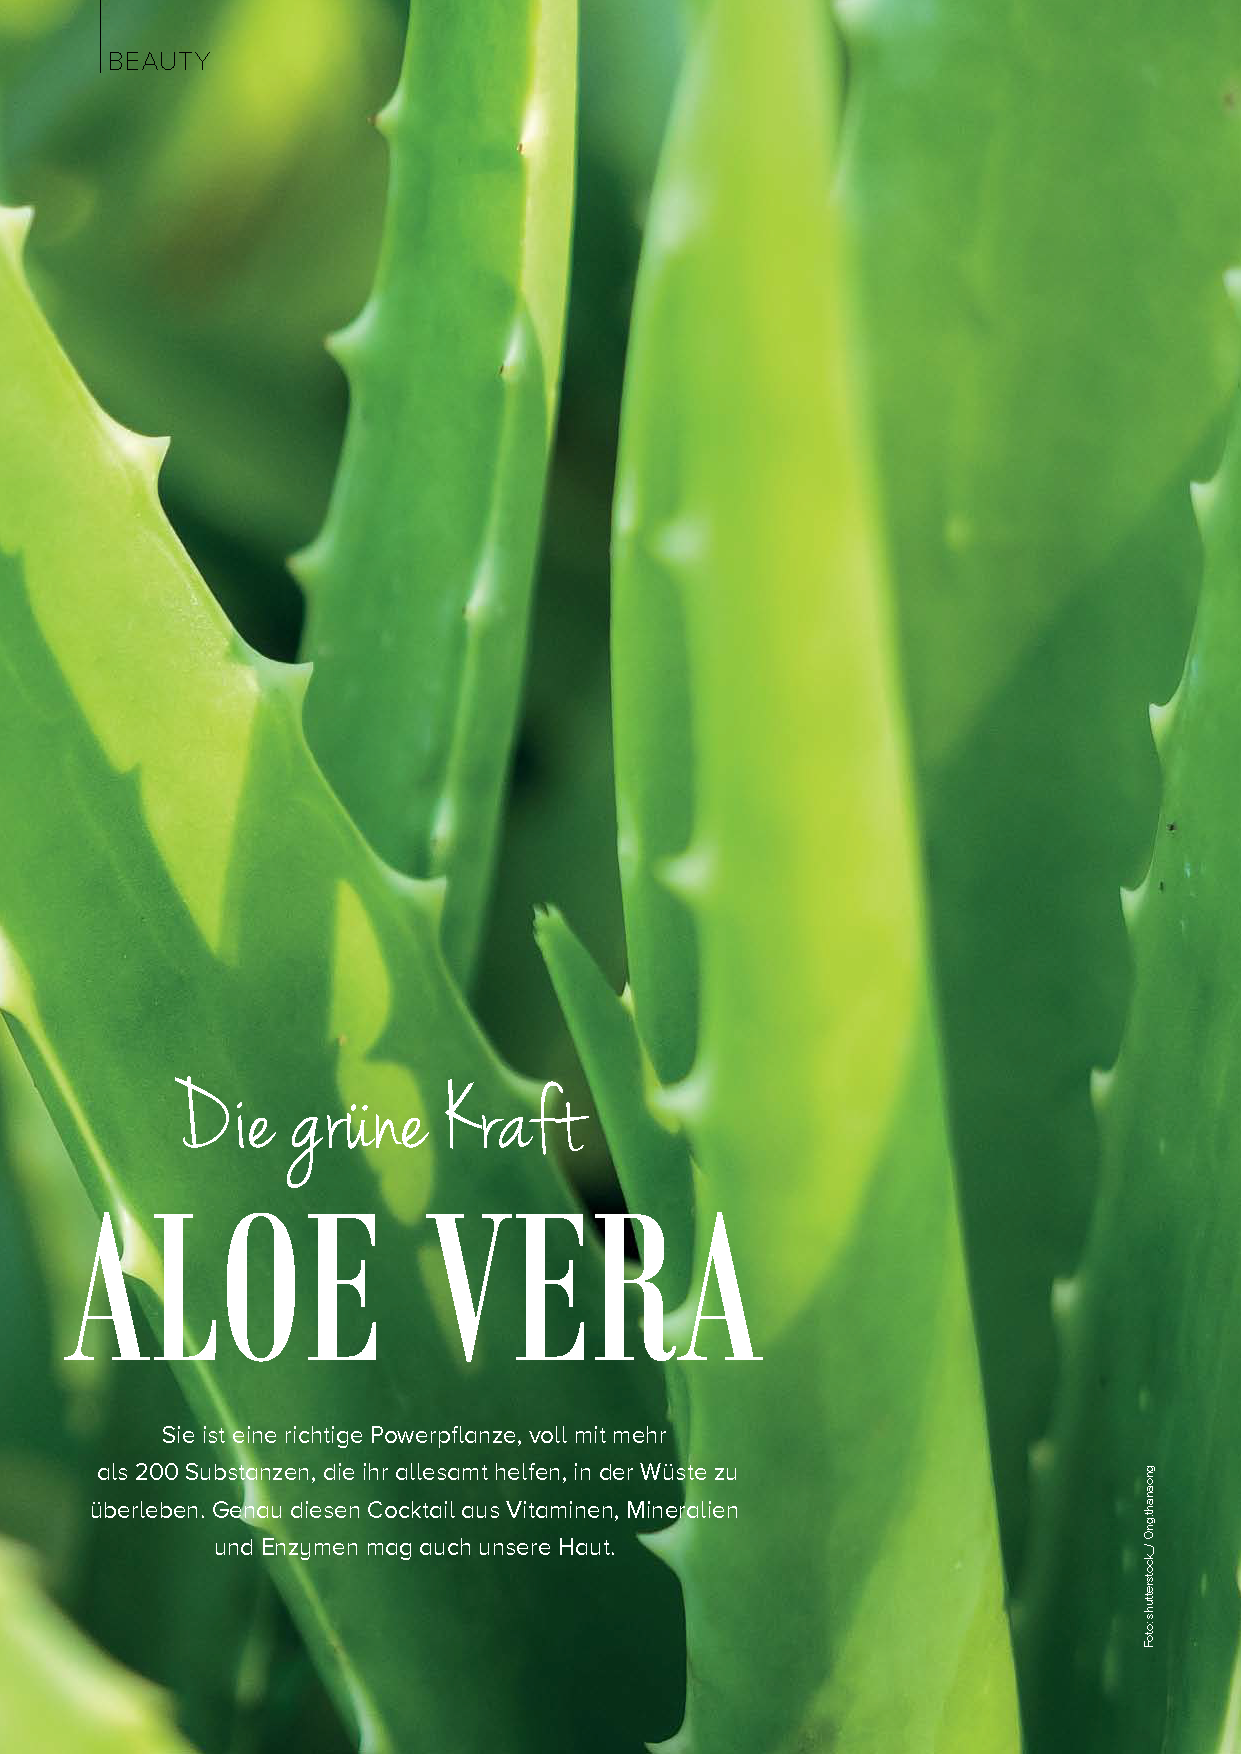 Aloe Vera - Die grüne Kraft